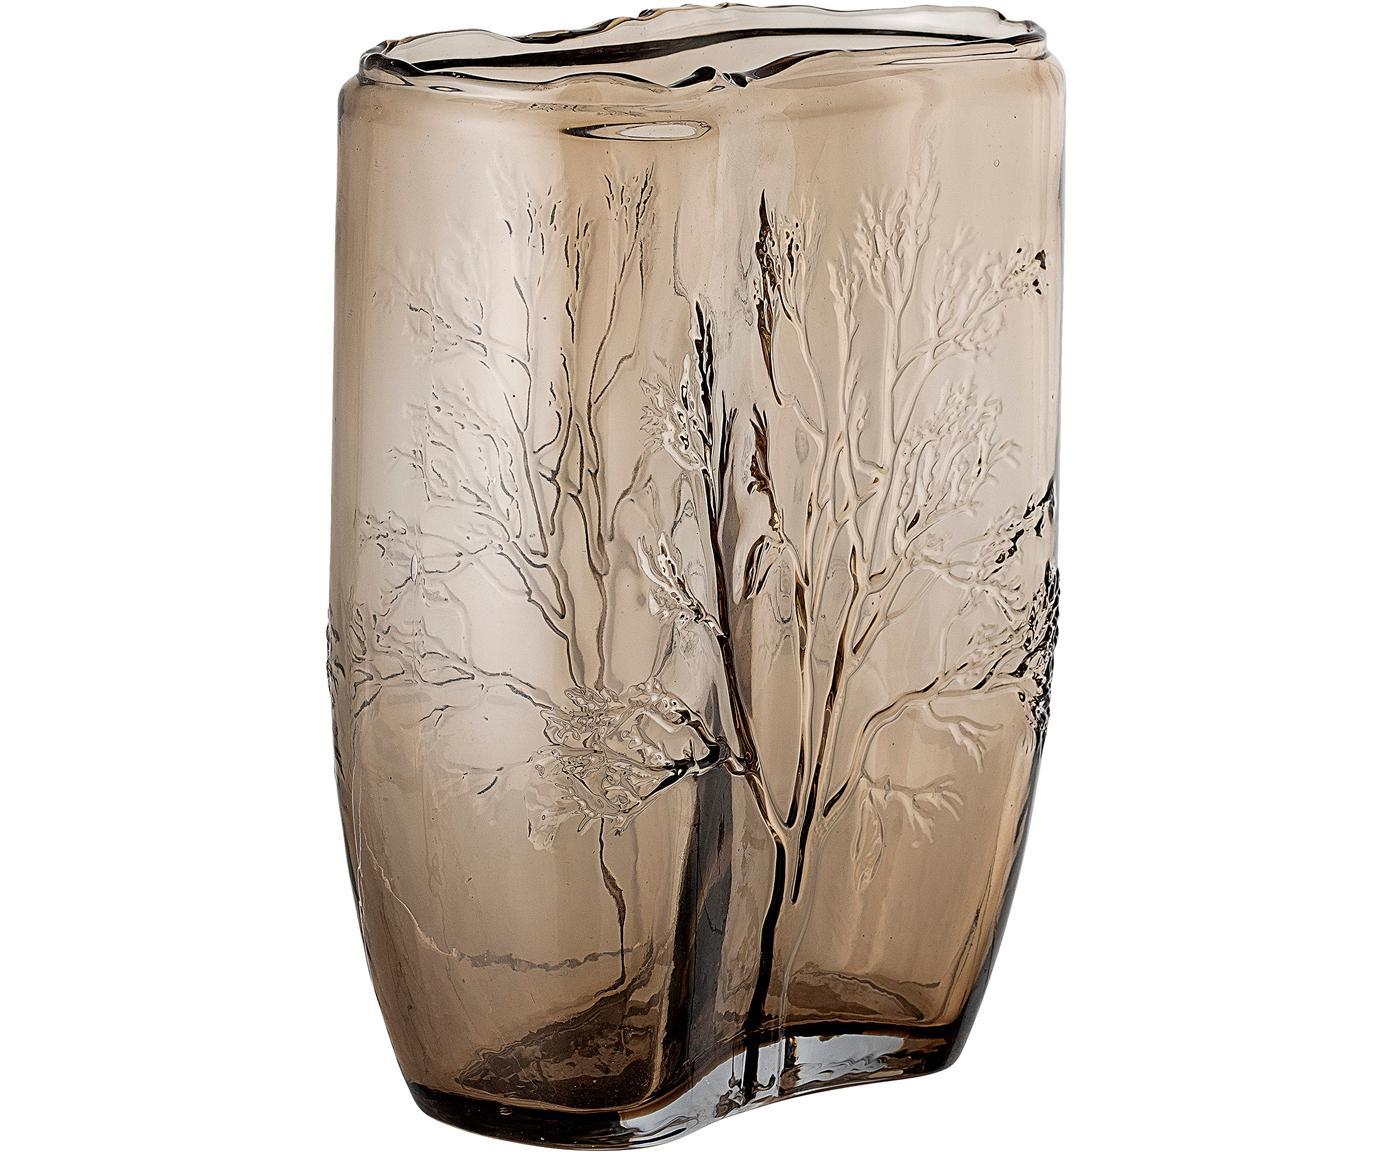 Glazen vaas Tree, Glas, Bruin, transparant, Ø 10 x H 26 cm